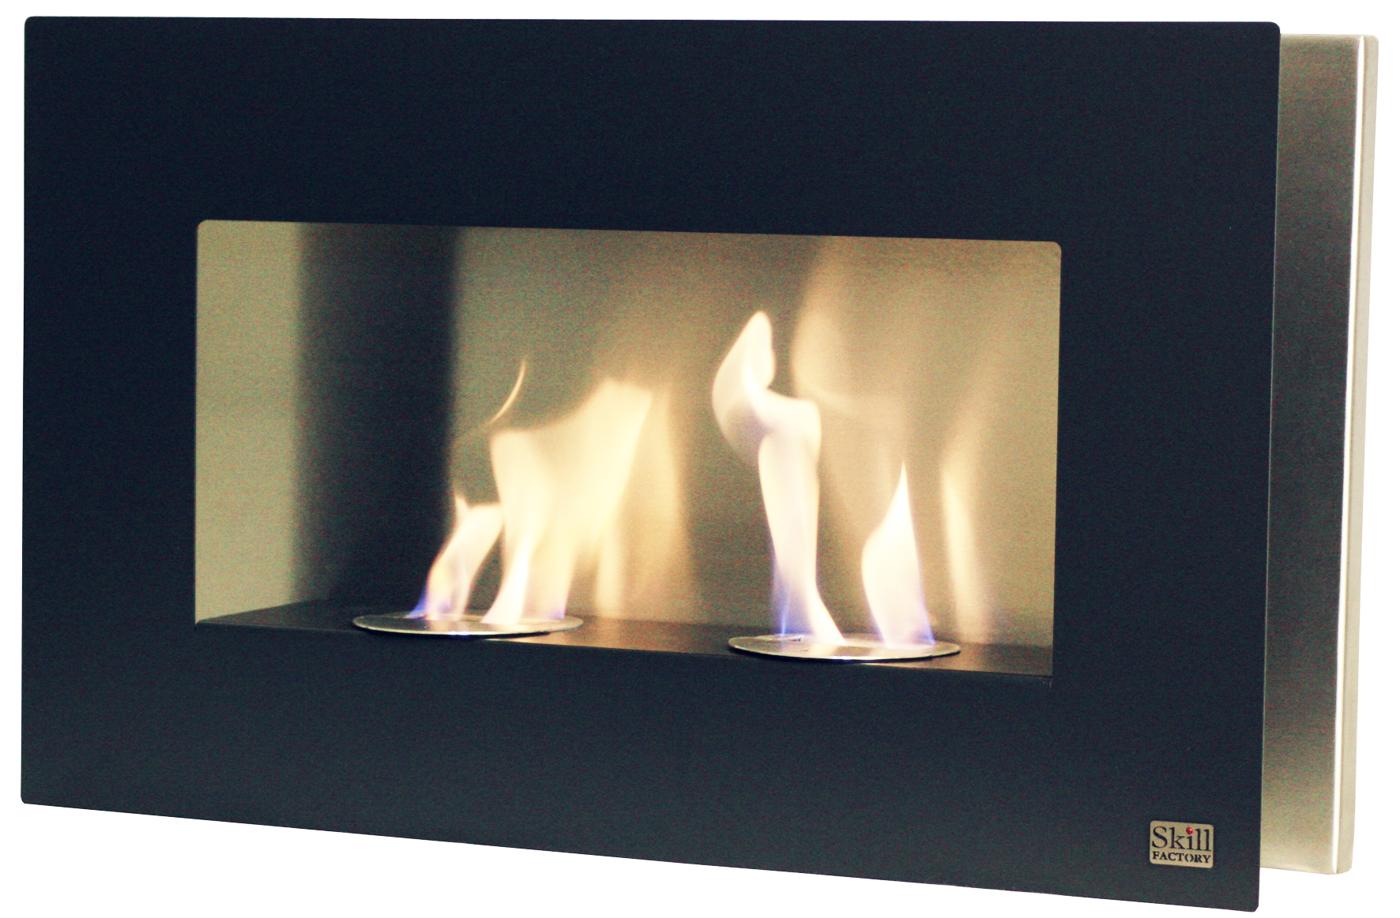 etanolspis-dekorationseld-brunnsboden-design-heminredning-Colorado-black-silver-inrdening-design-brunnsboden1